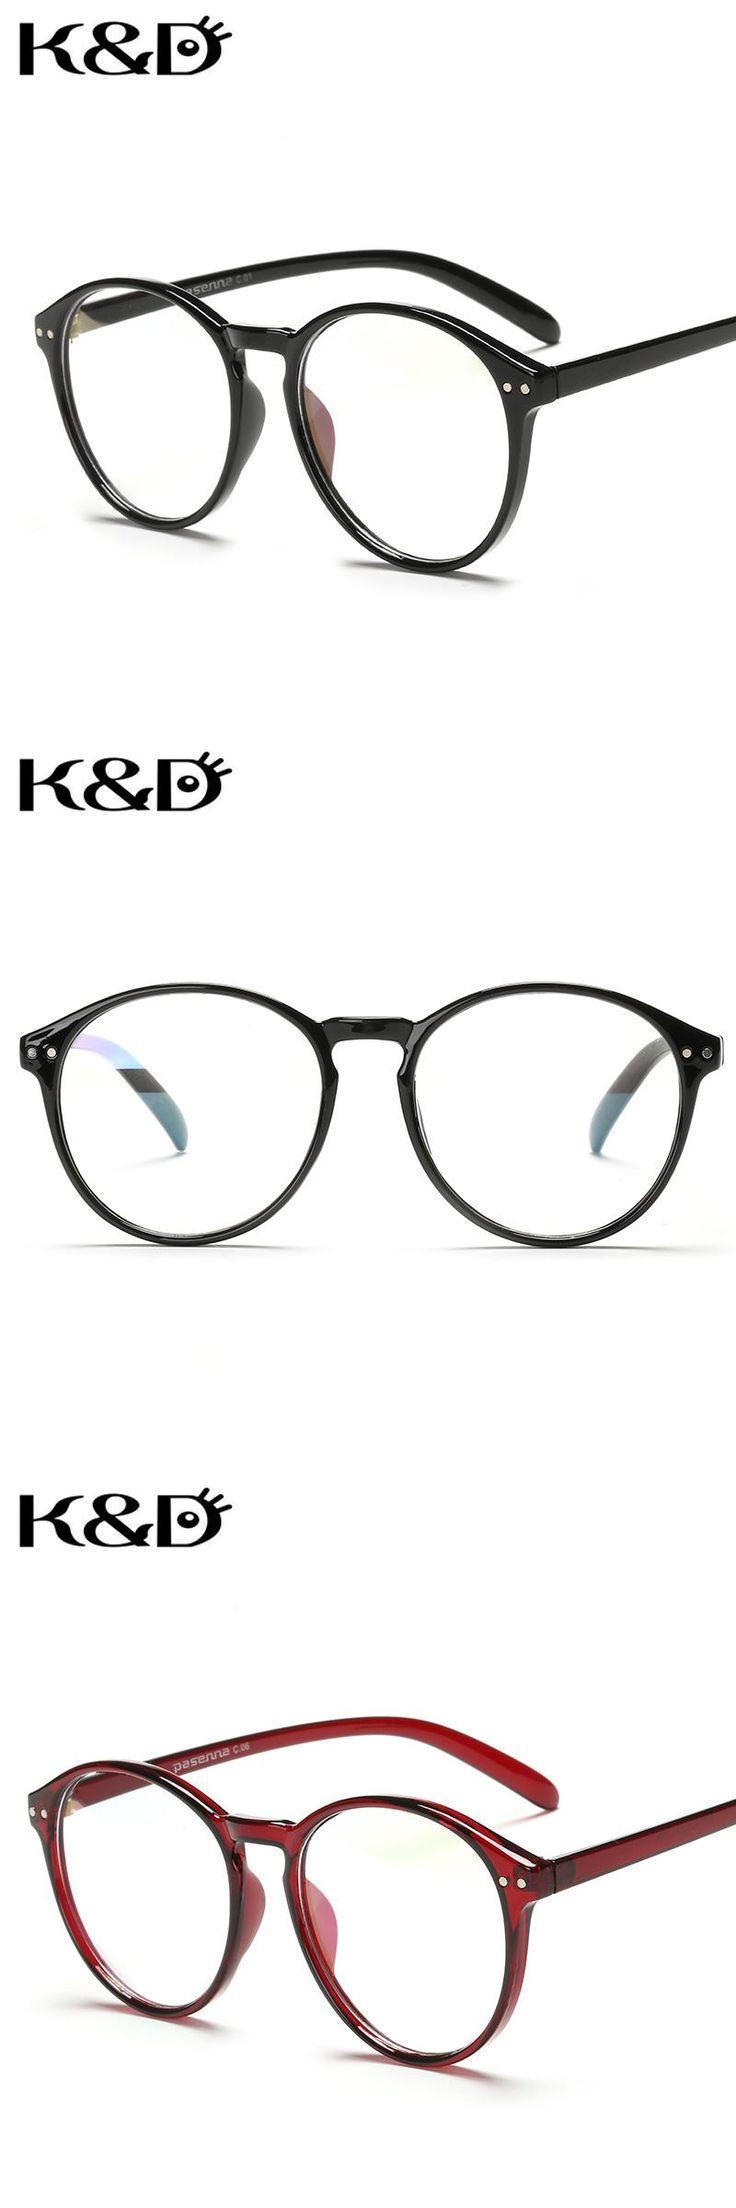 K&D Optical Frame Eyewear Glasses Solid Floral Round Circle Shape Computer Man Woman Unisex Fashion Retro